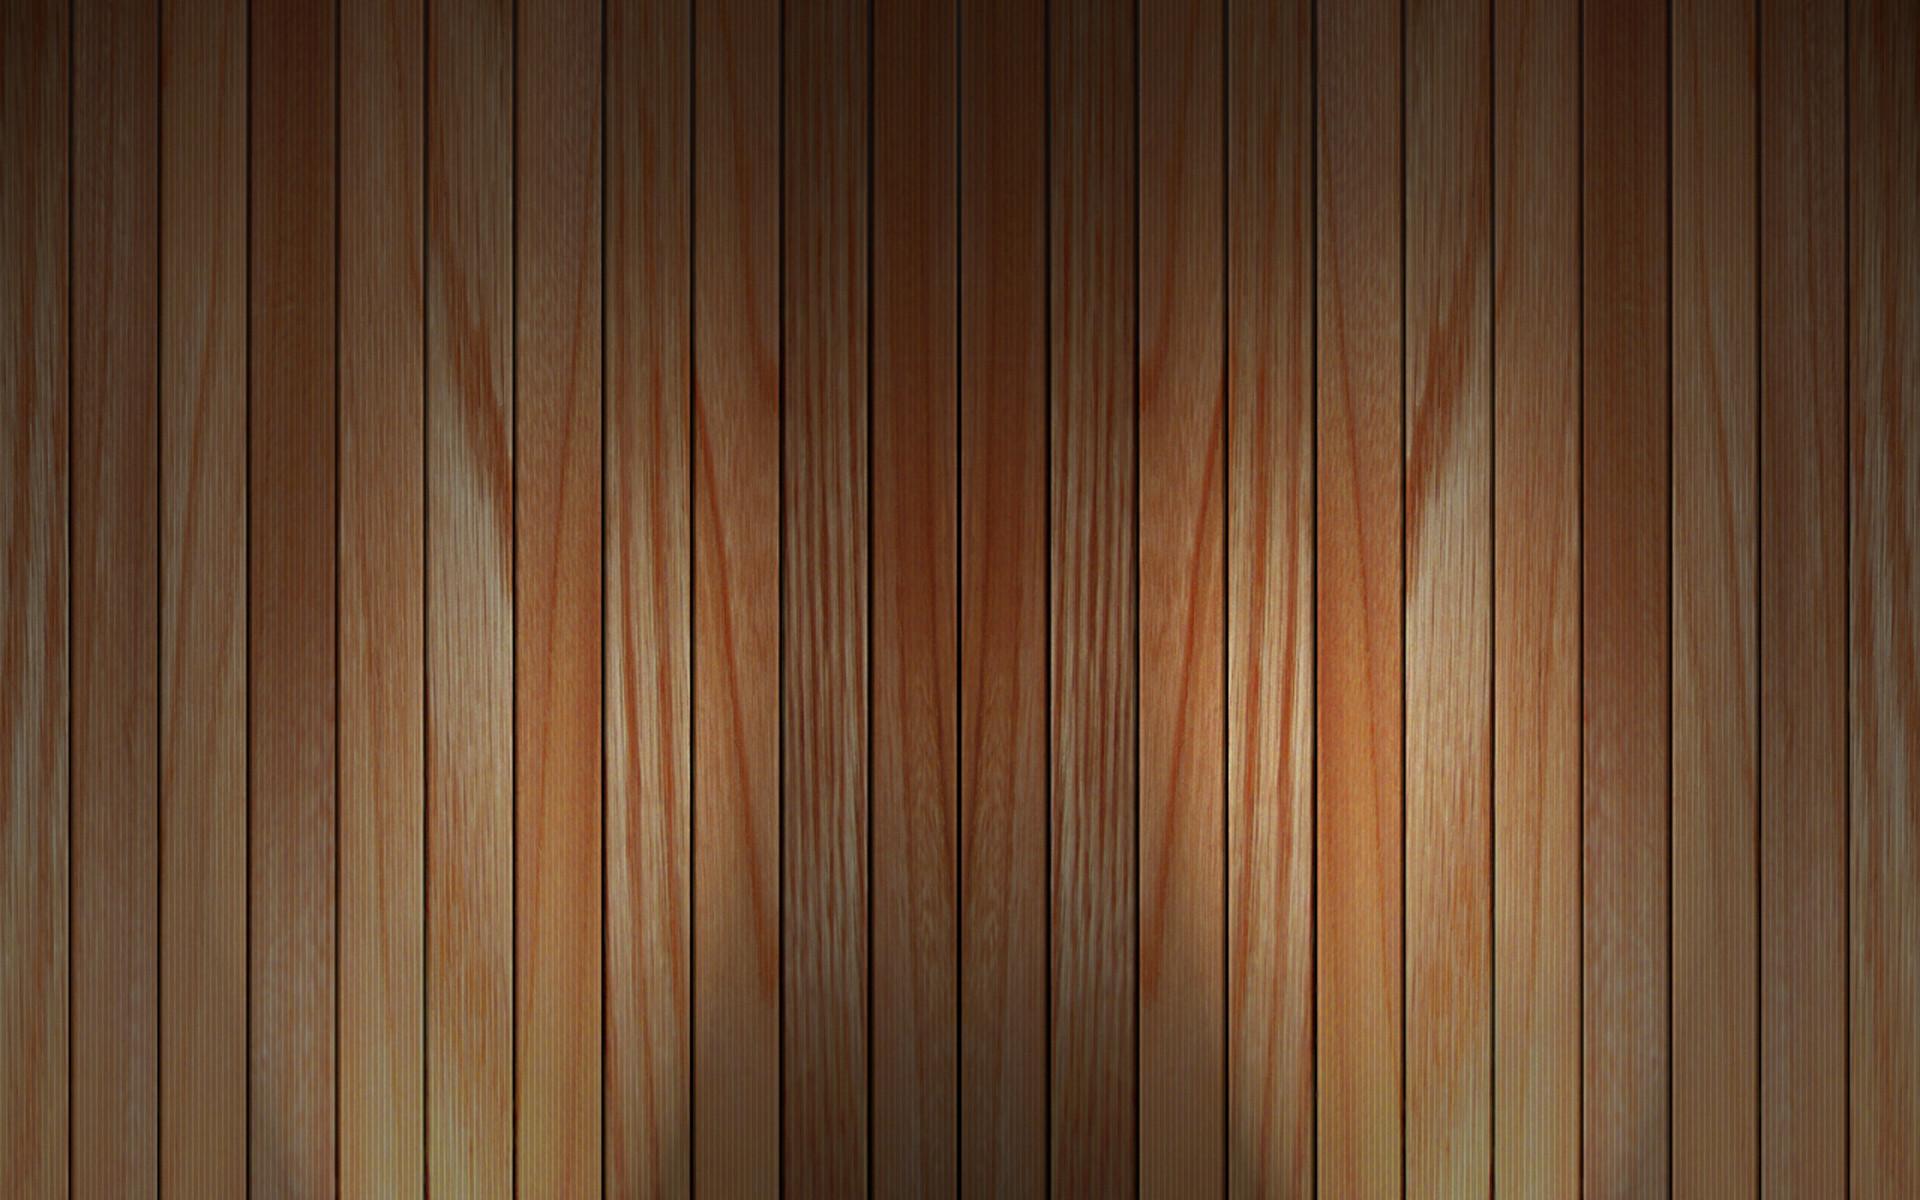 Hd Wood Grain Wallpapers Pixelstalknet .